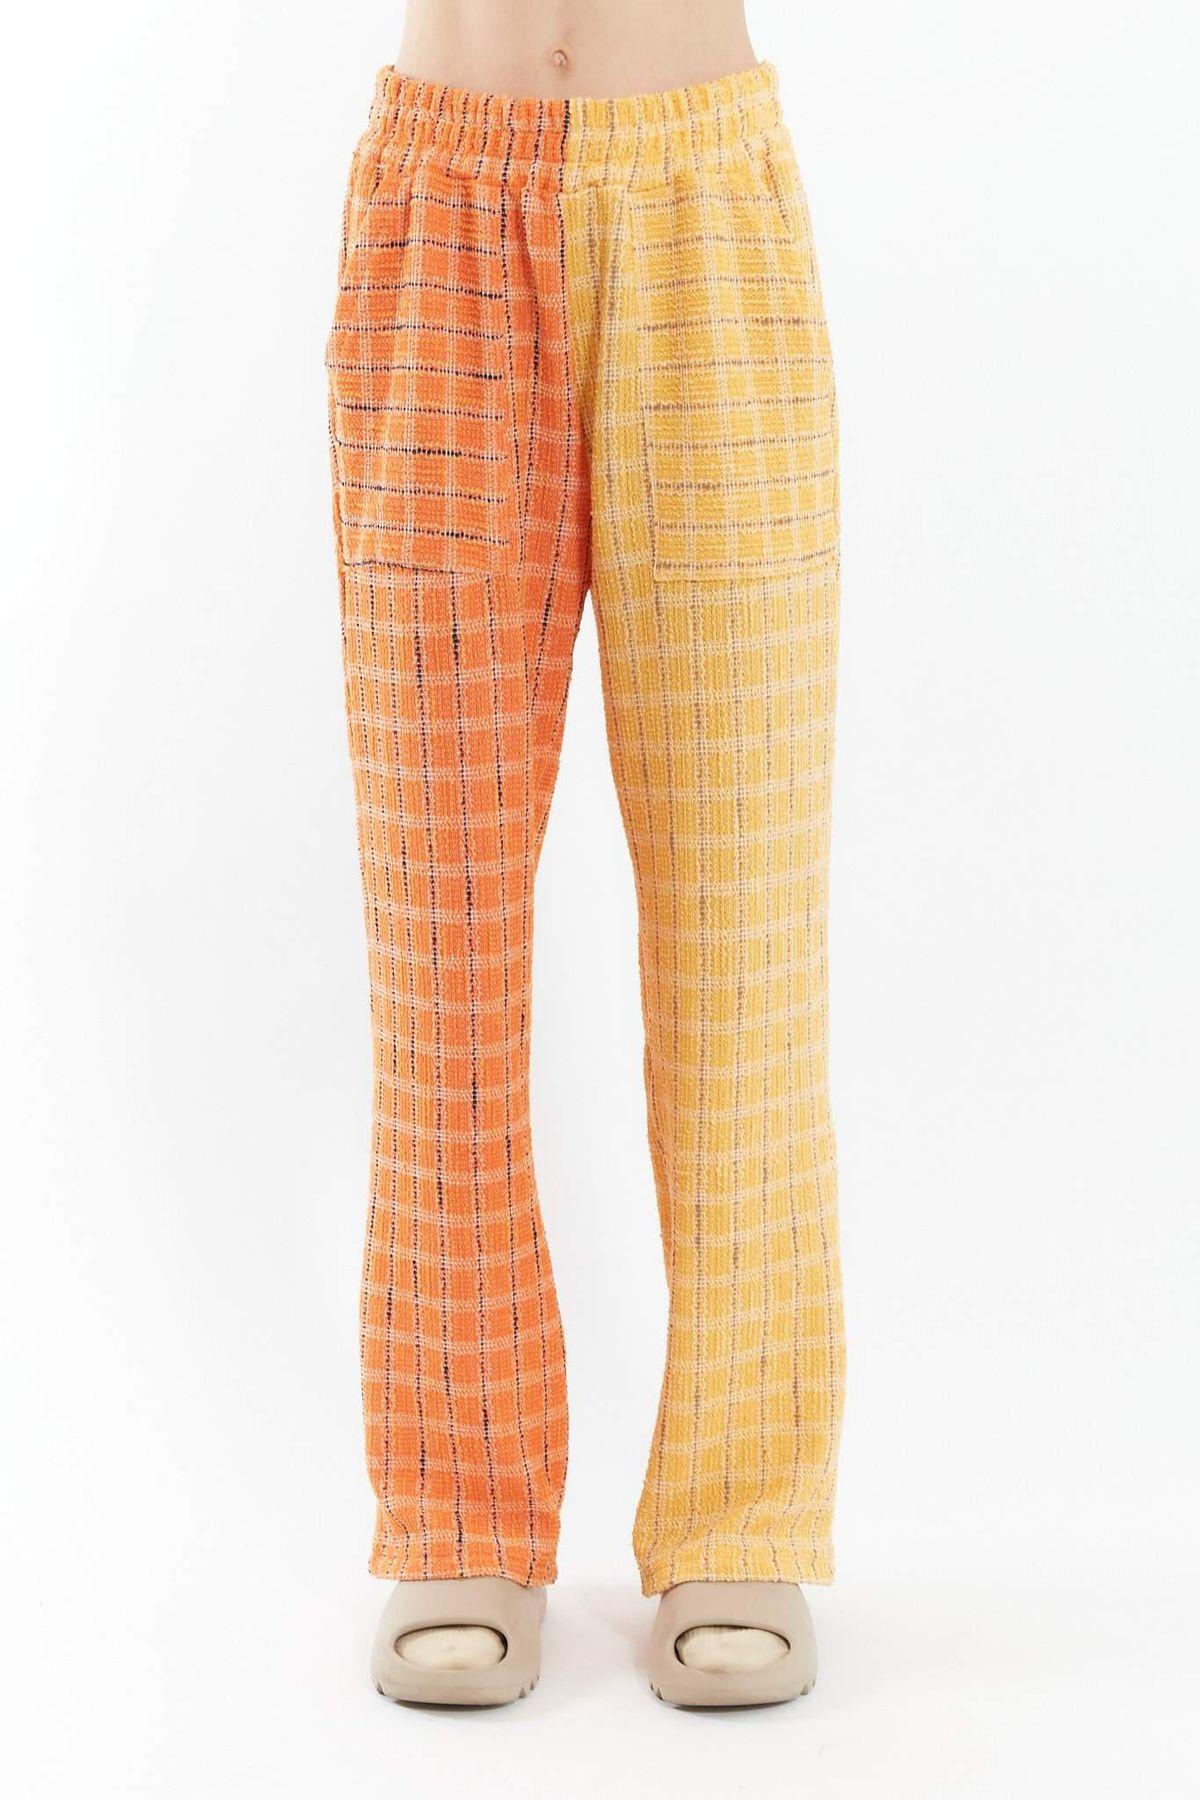 division yellow orange lounge pants